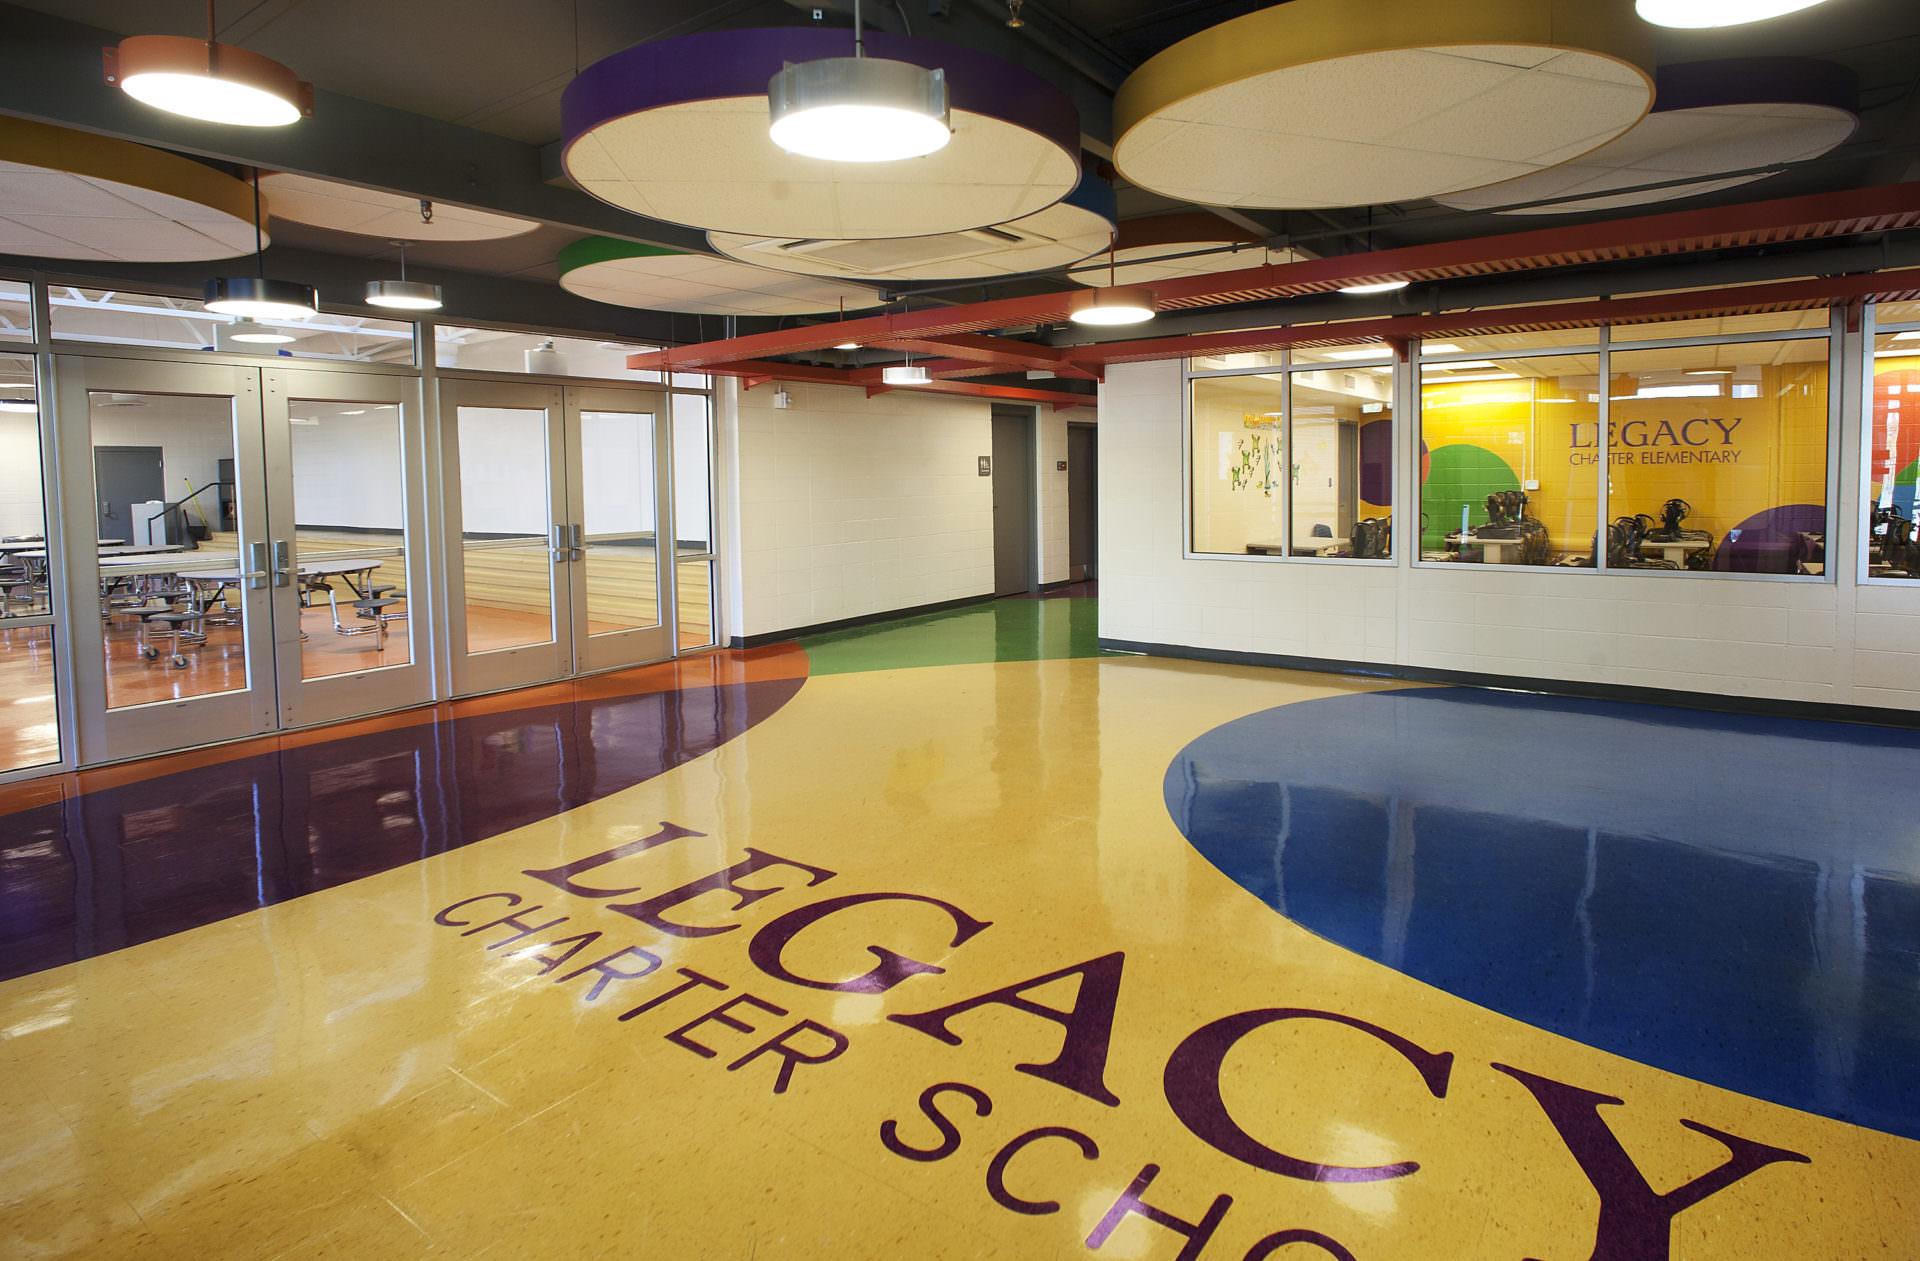 Legacy charter elementary school craig gaulden davis - Interior design schools in south carolina ...